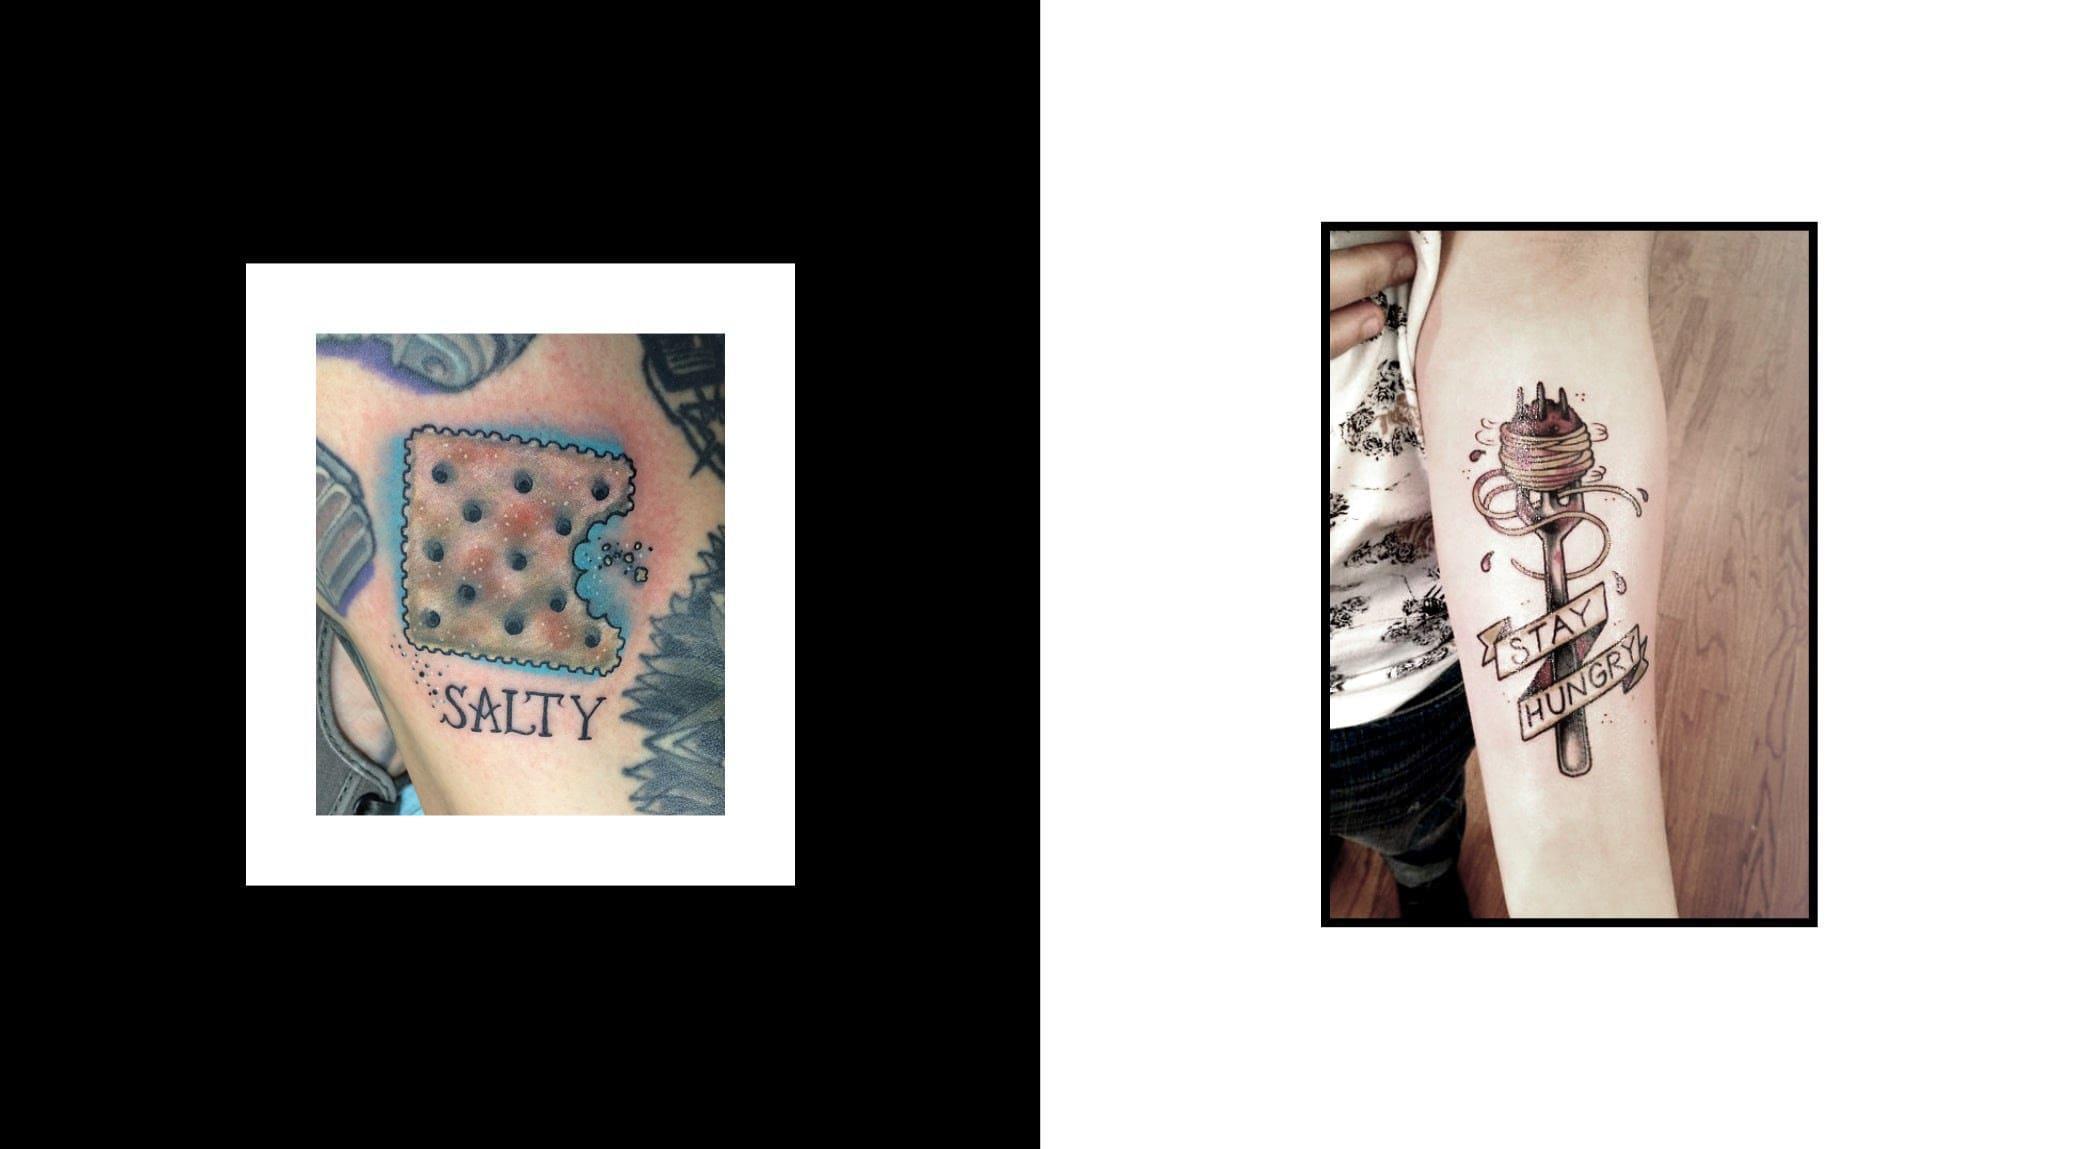 original_013-tattoo-finedininglovers13.jpg